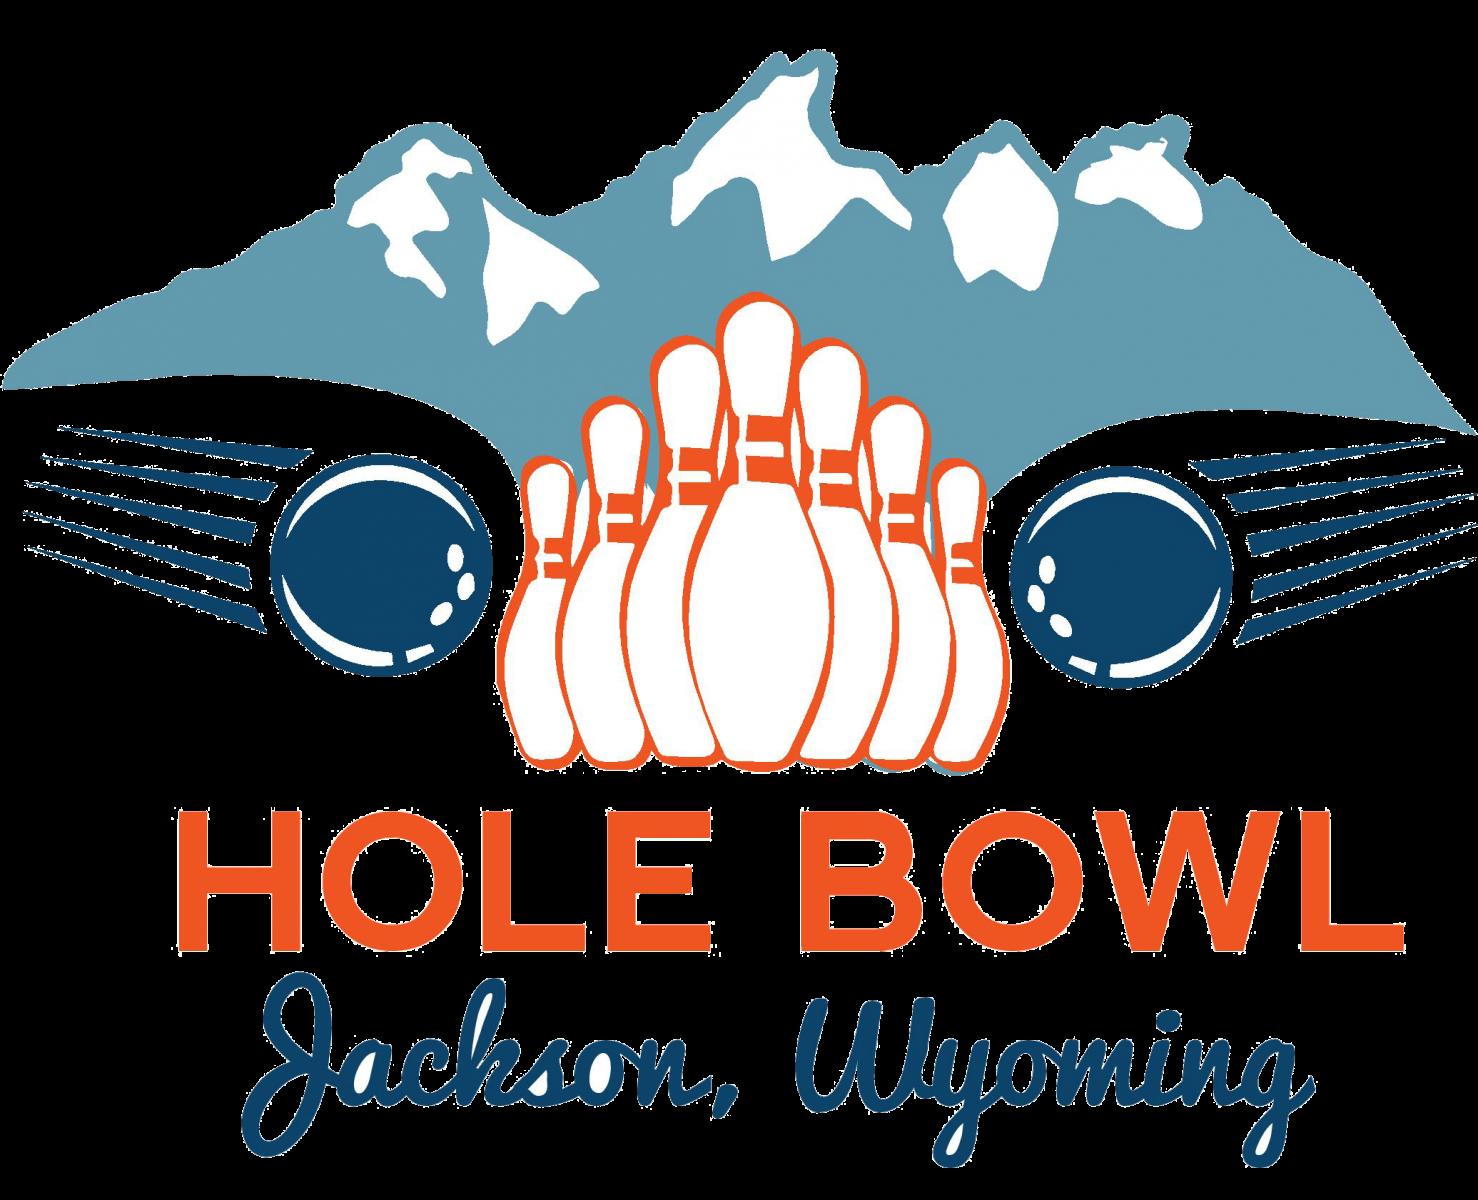 Jackson's Hole Bowl Fills Indoor Recreation Need Photo